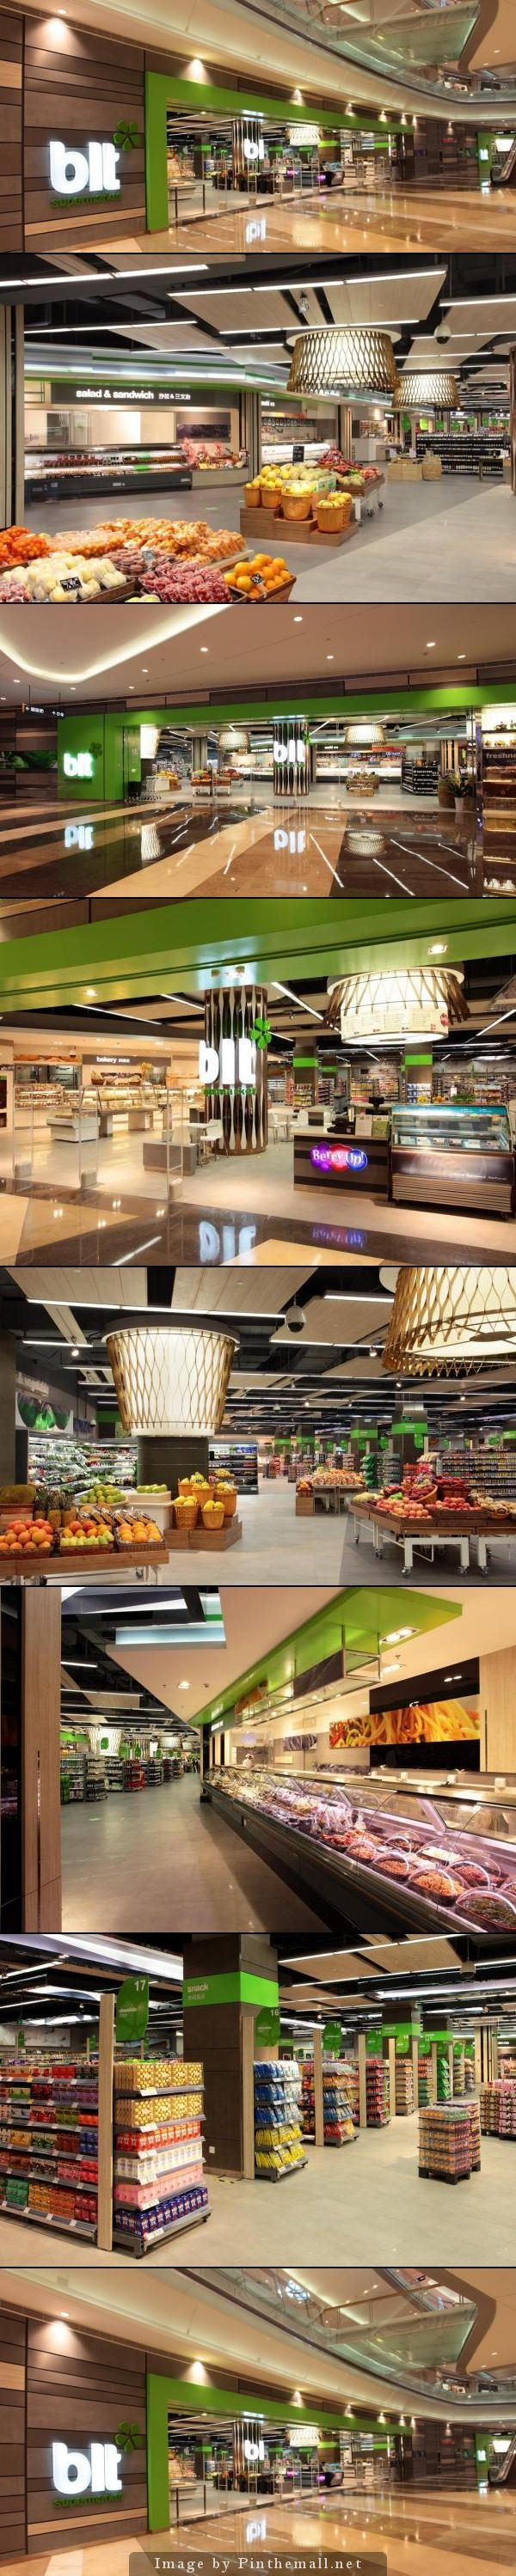 blt* supermarket, kk mall, shenzhen